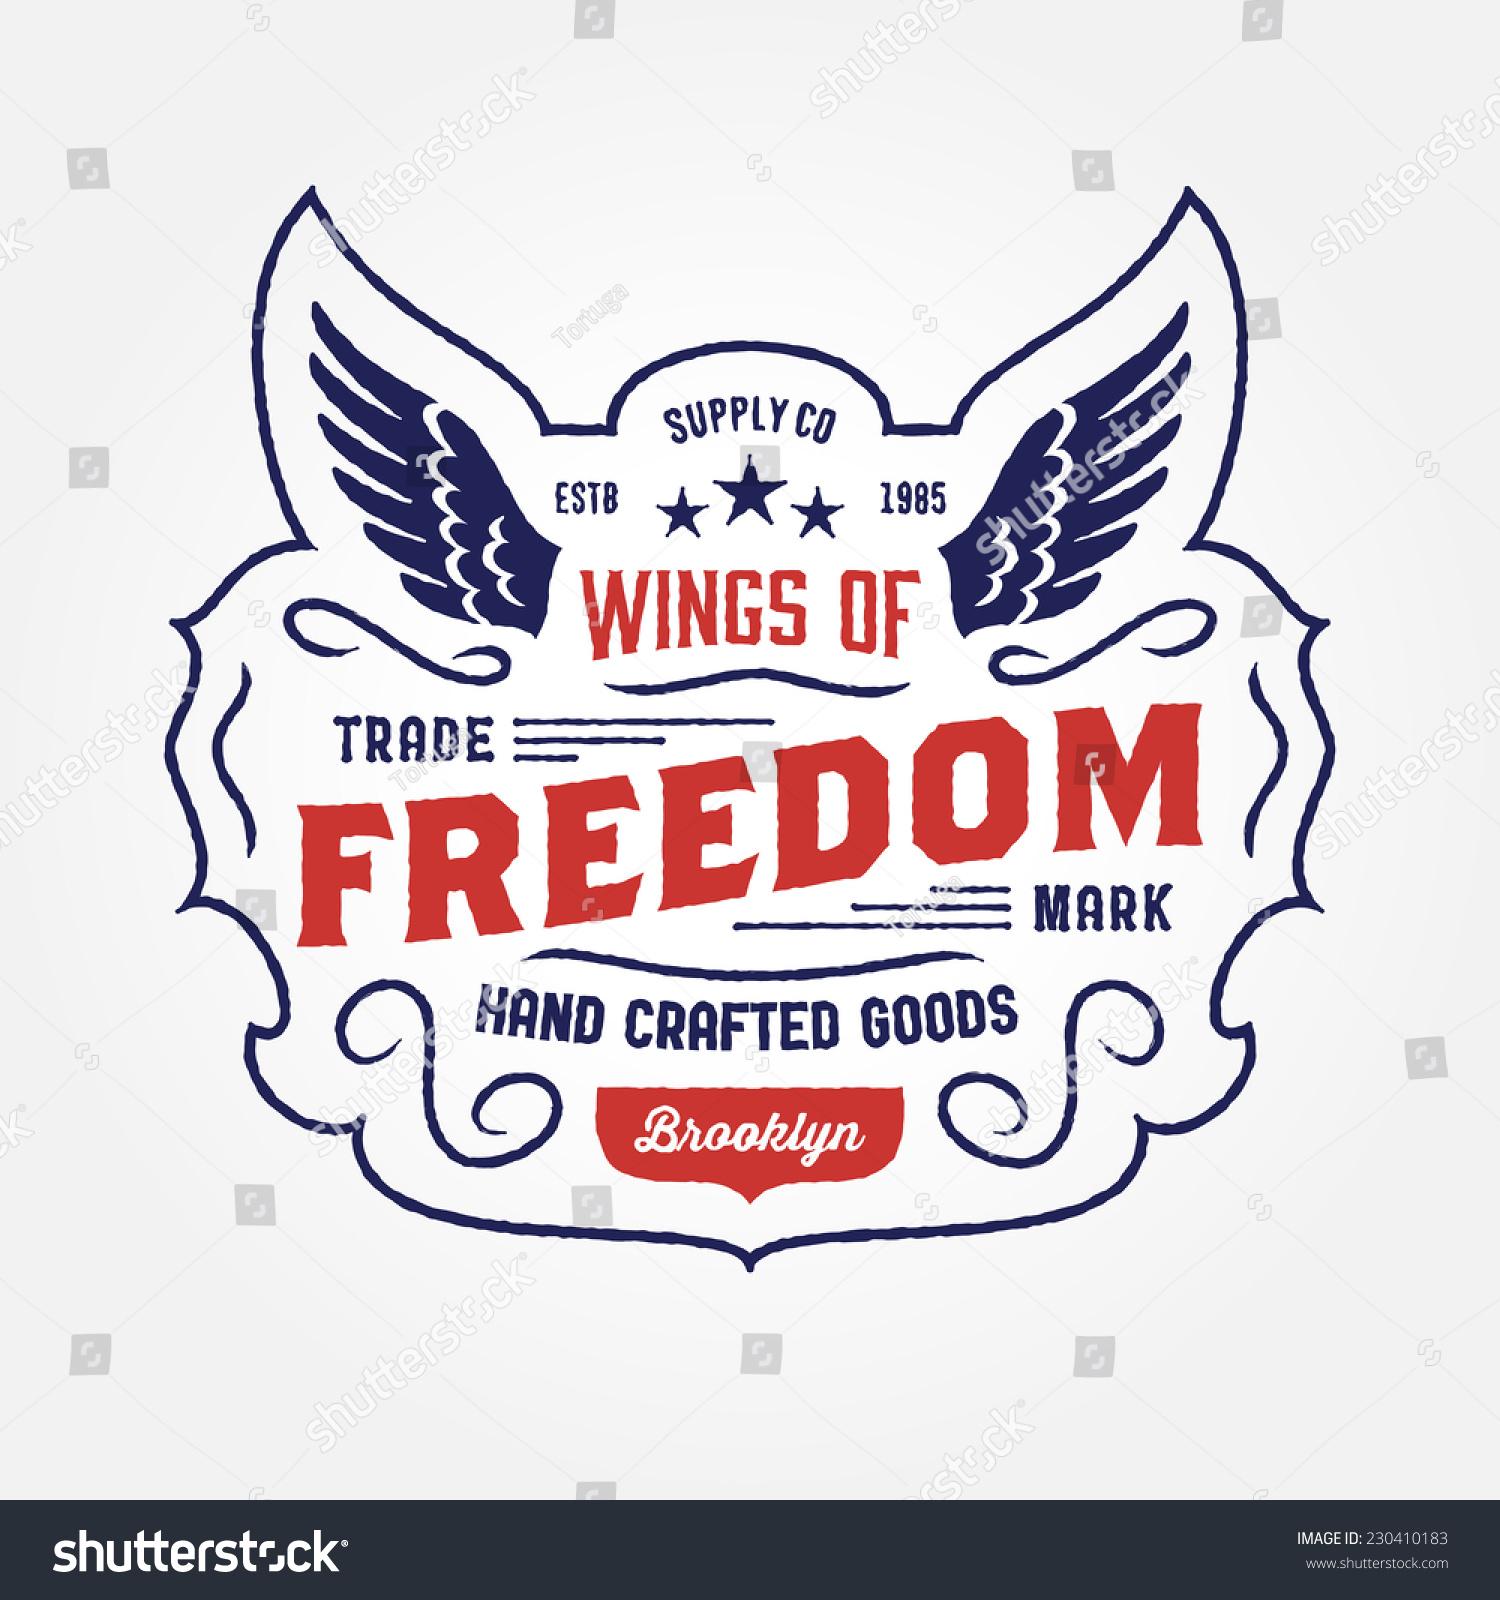 Shirt design vintage - Original Retro T Shirt Apparel Graphic Design Vintage Hand Crafted Logo Wings Of